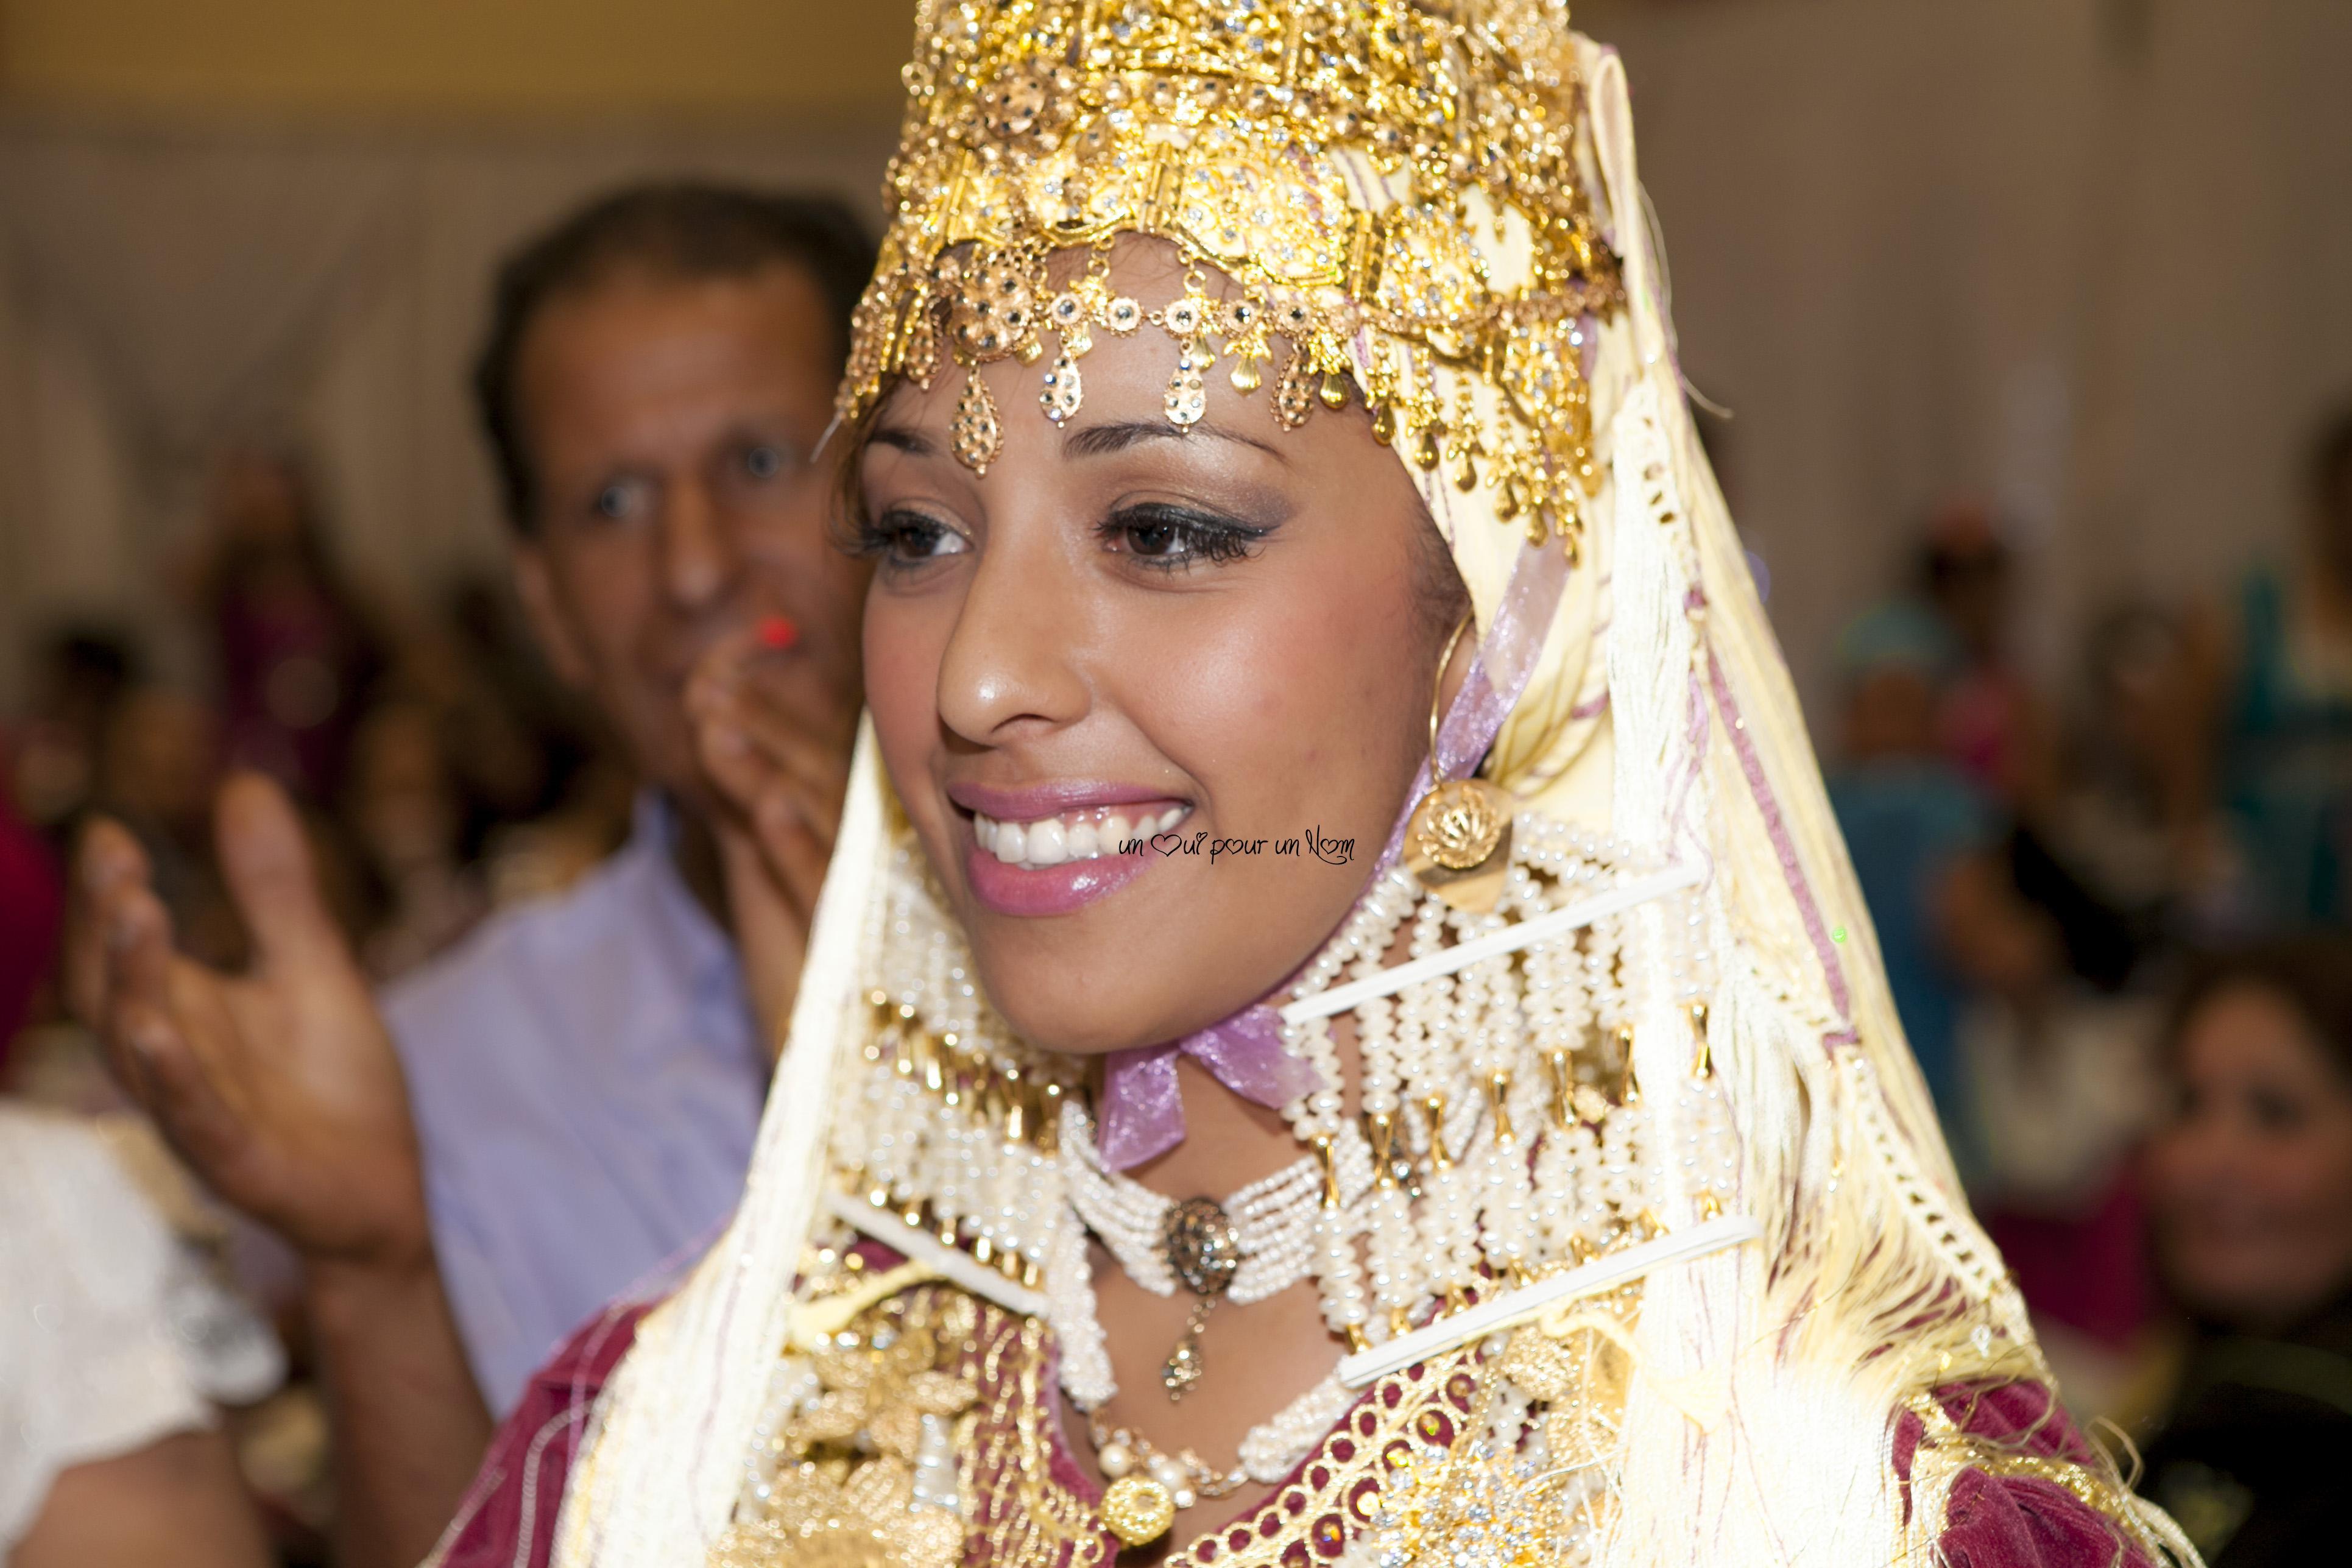 photographe cameraman mariage oriental perpignan - Photographe Mariage Oriental